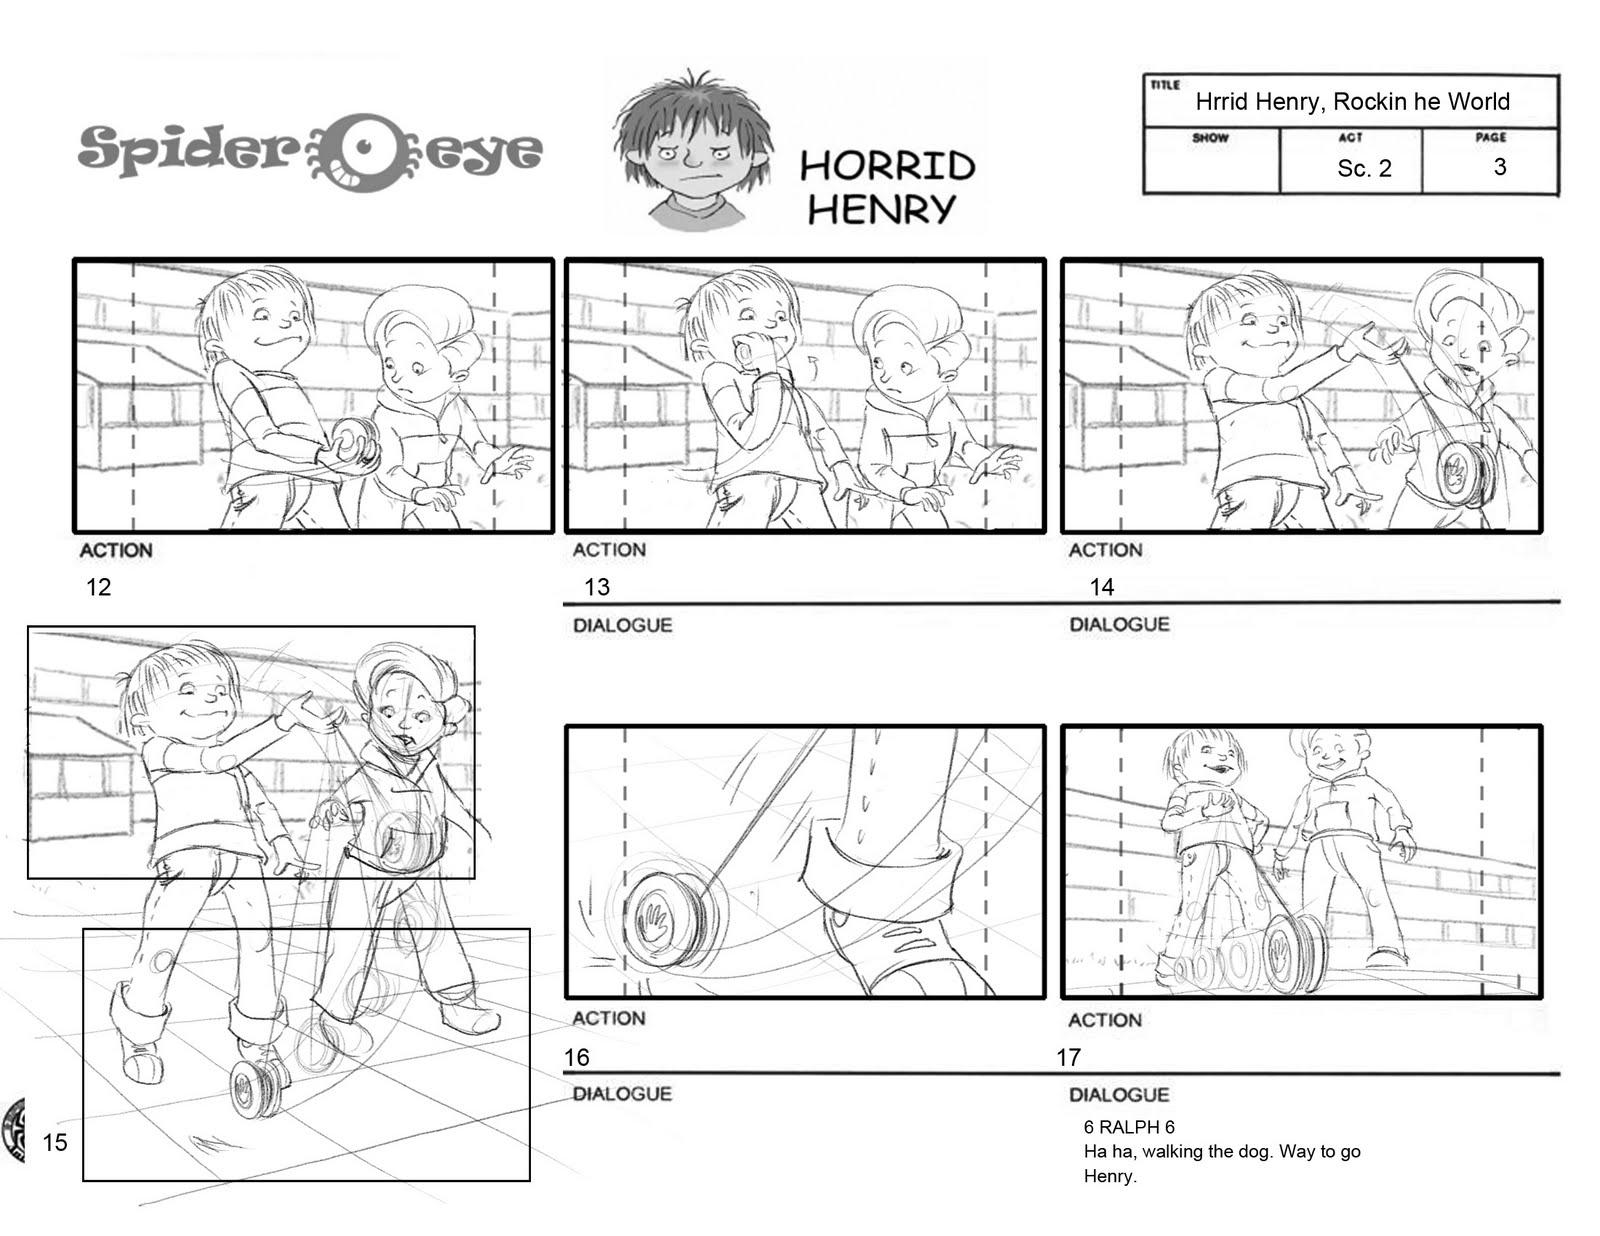 Horrid Henry Rockin The World Excerpts 1